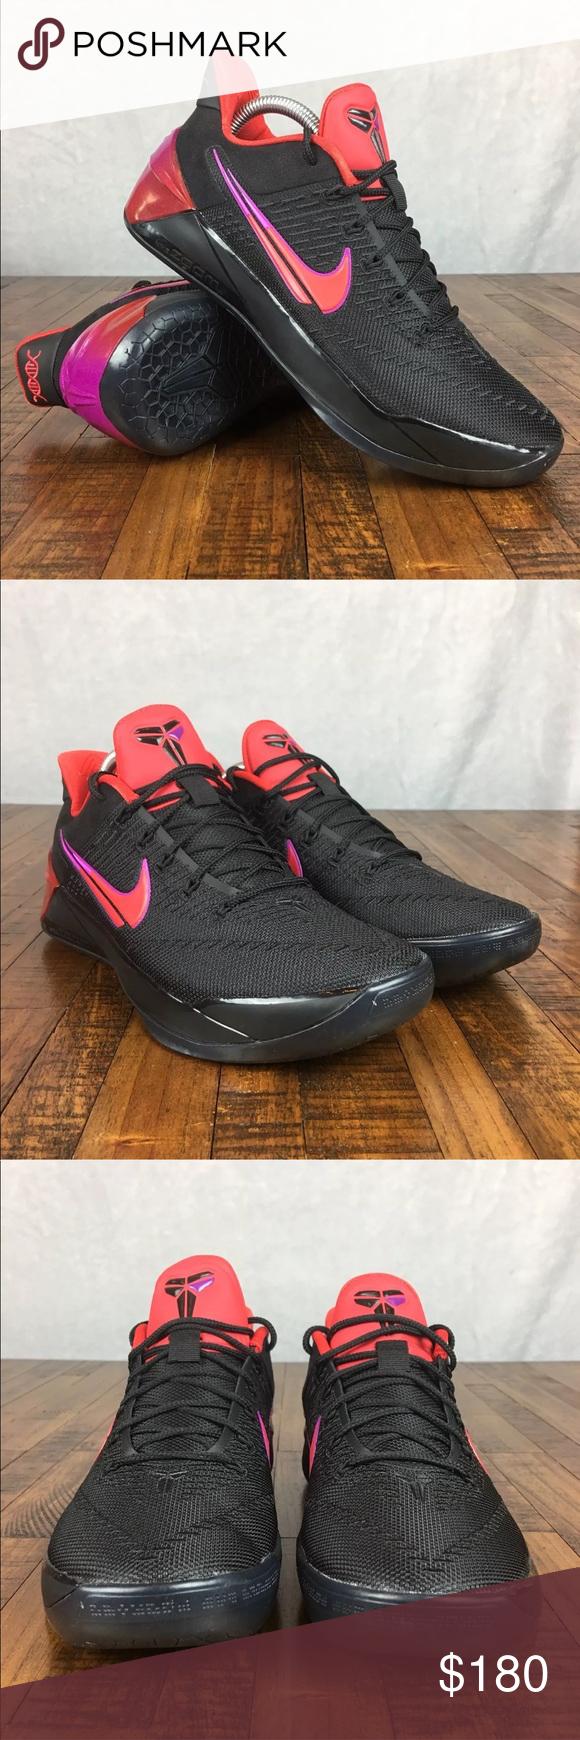 30ecc8d0da39 Nike Kobe A.D. Flip The Switch Sneakers 852425-004 NIKE KOBE A.D. FLIP THE  SWITCH